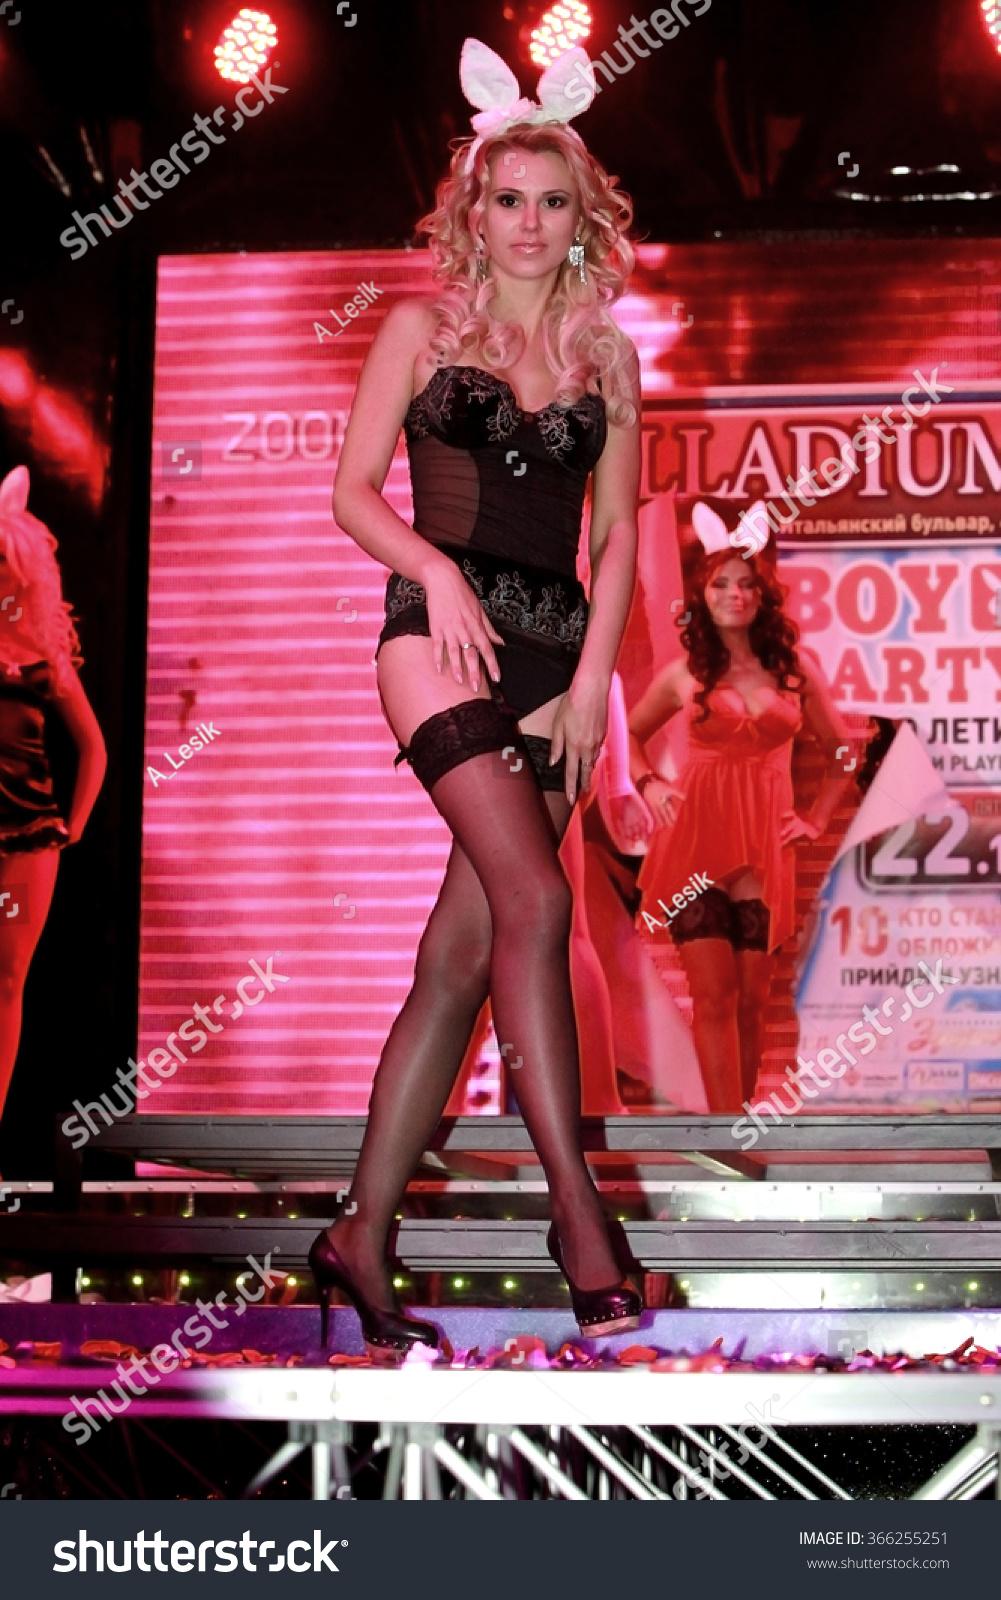 stock photo odessa ukraine october jubilee magazine playboy nightclub beautiful girls